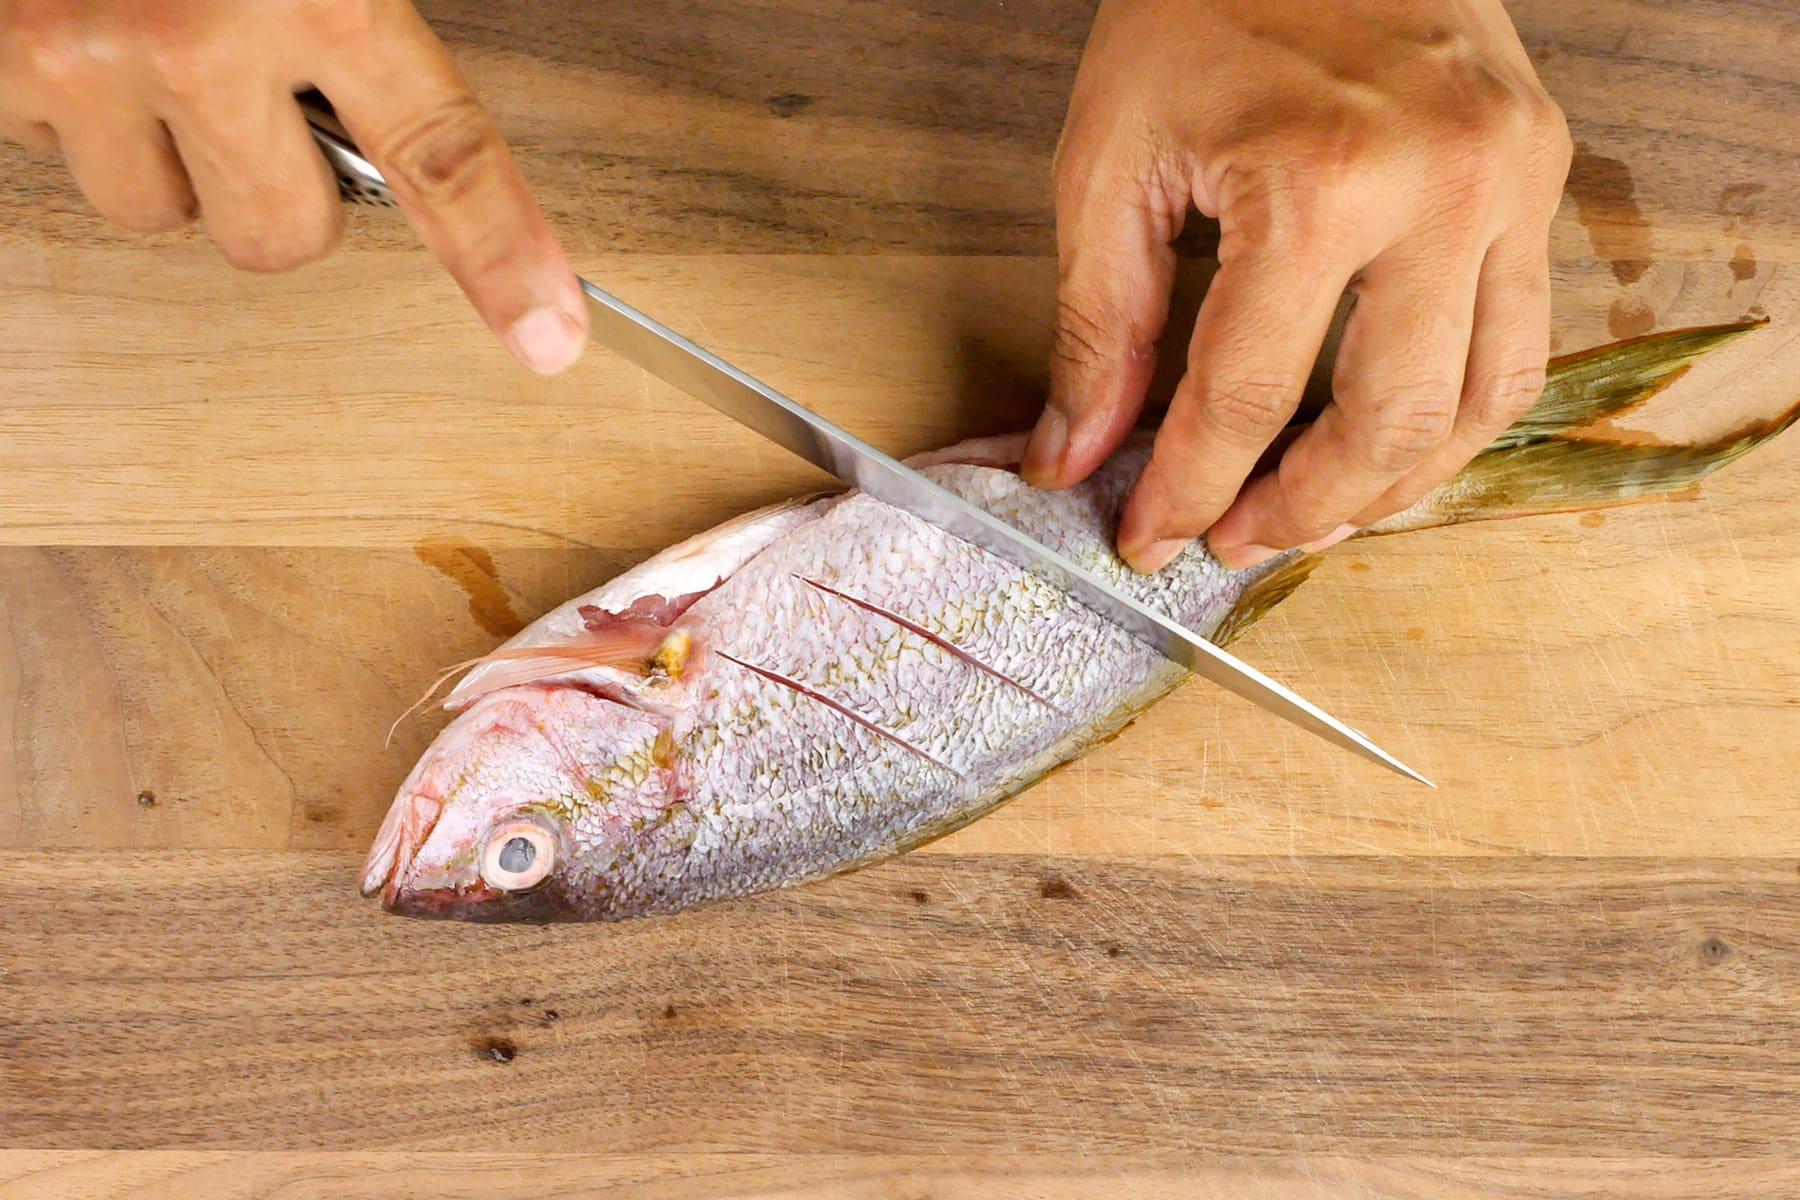 Making diagonal cuts into the fish